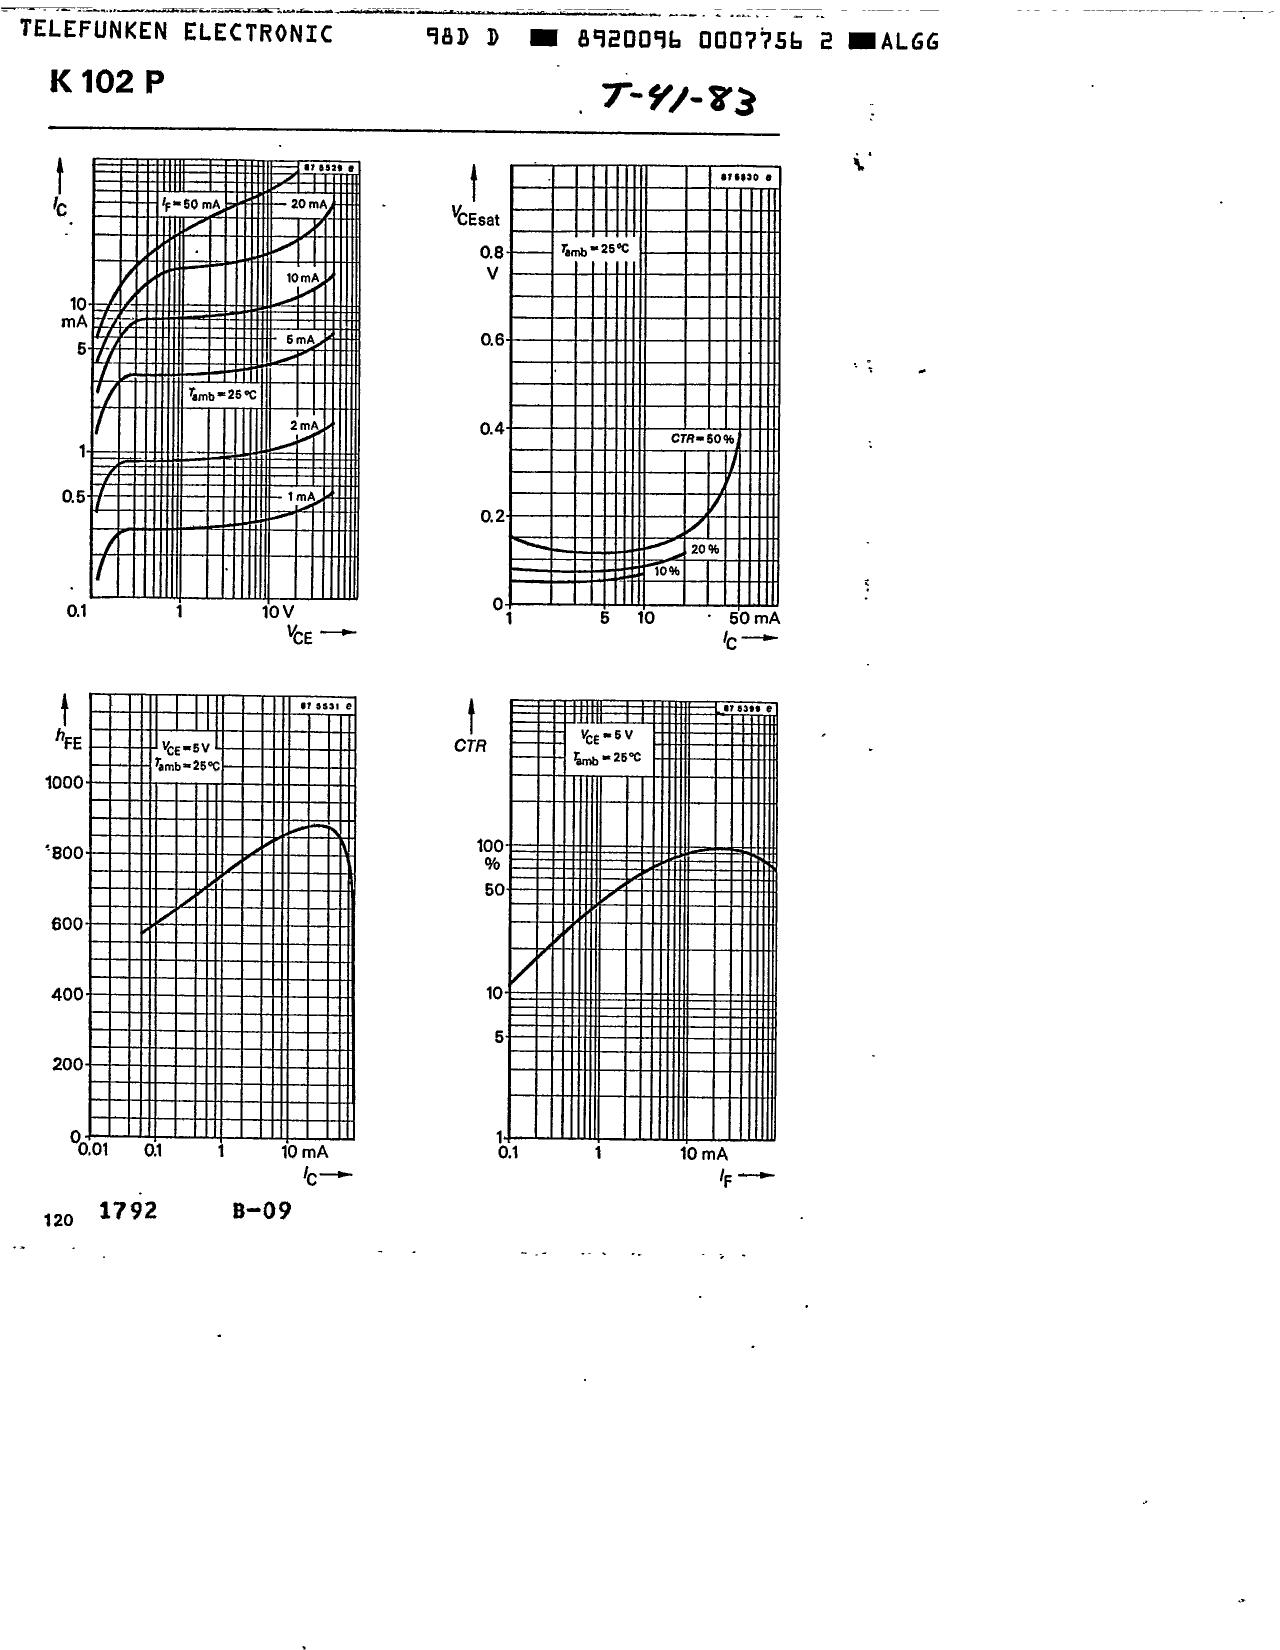 K102P pdf